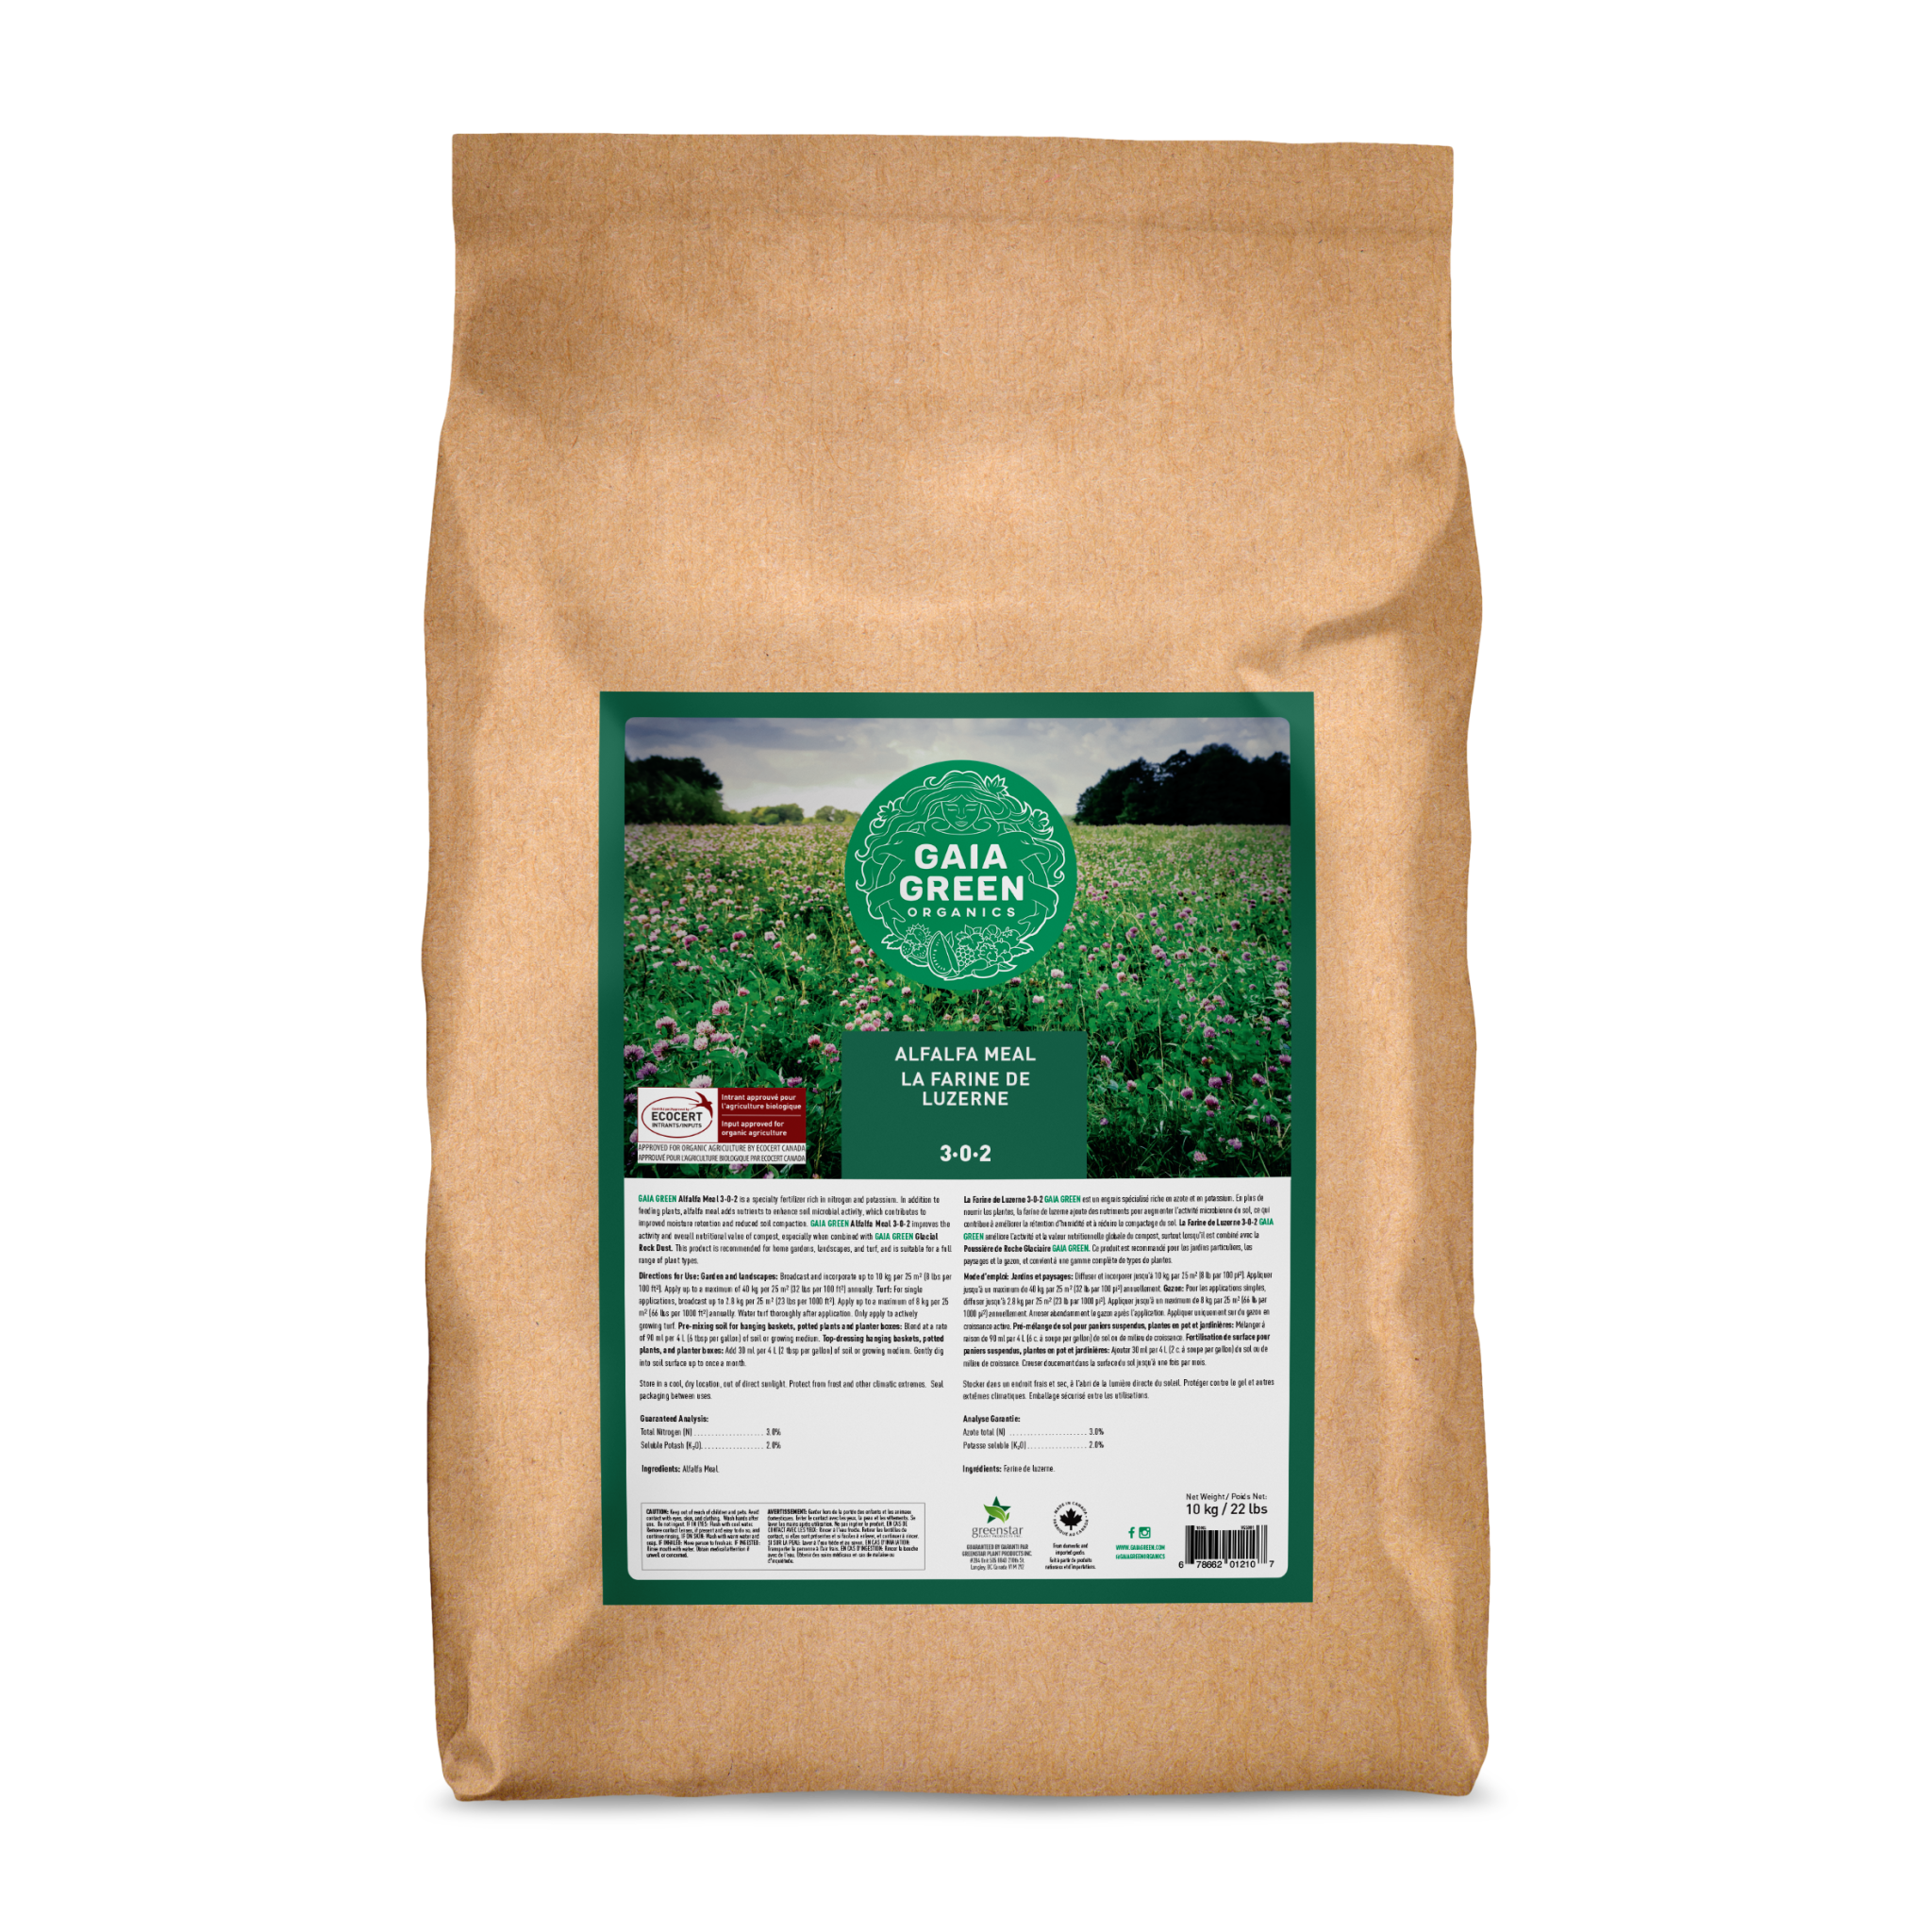 Gaia Green Alfalfa Meal